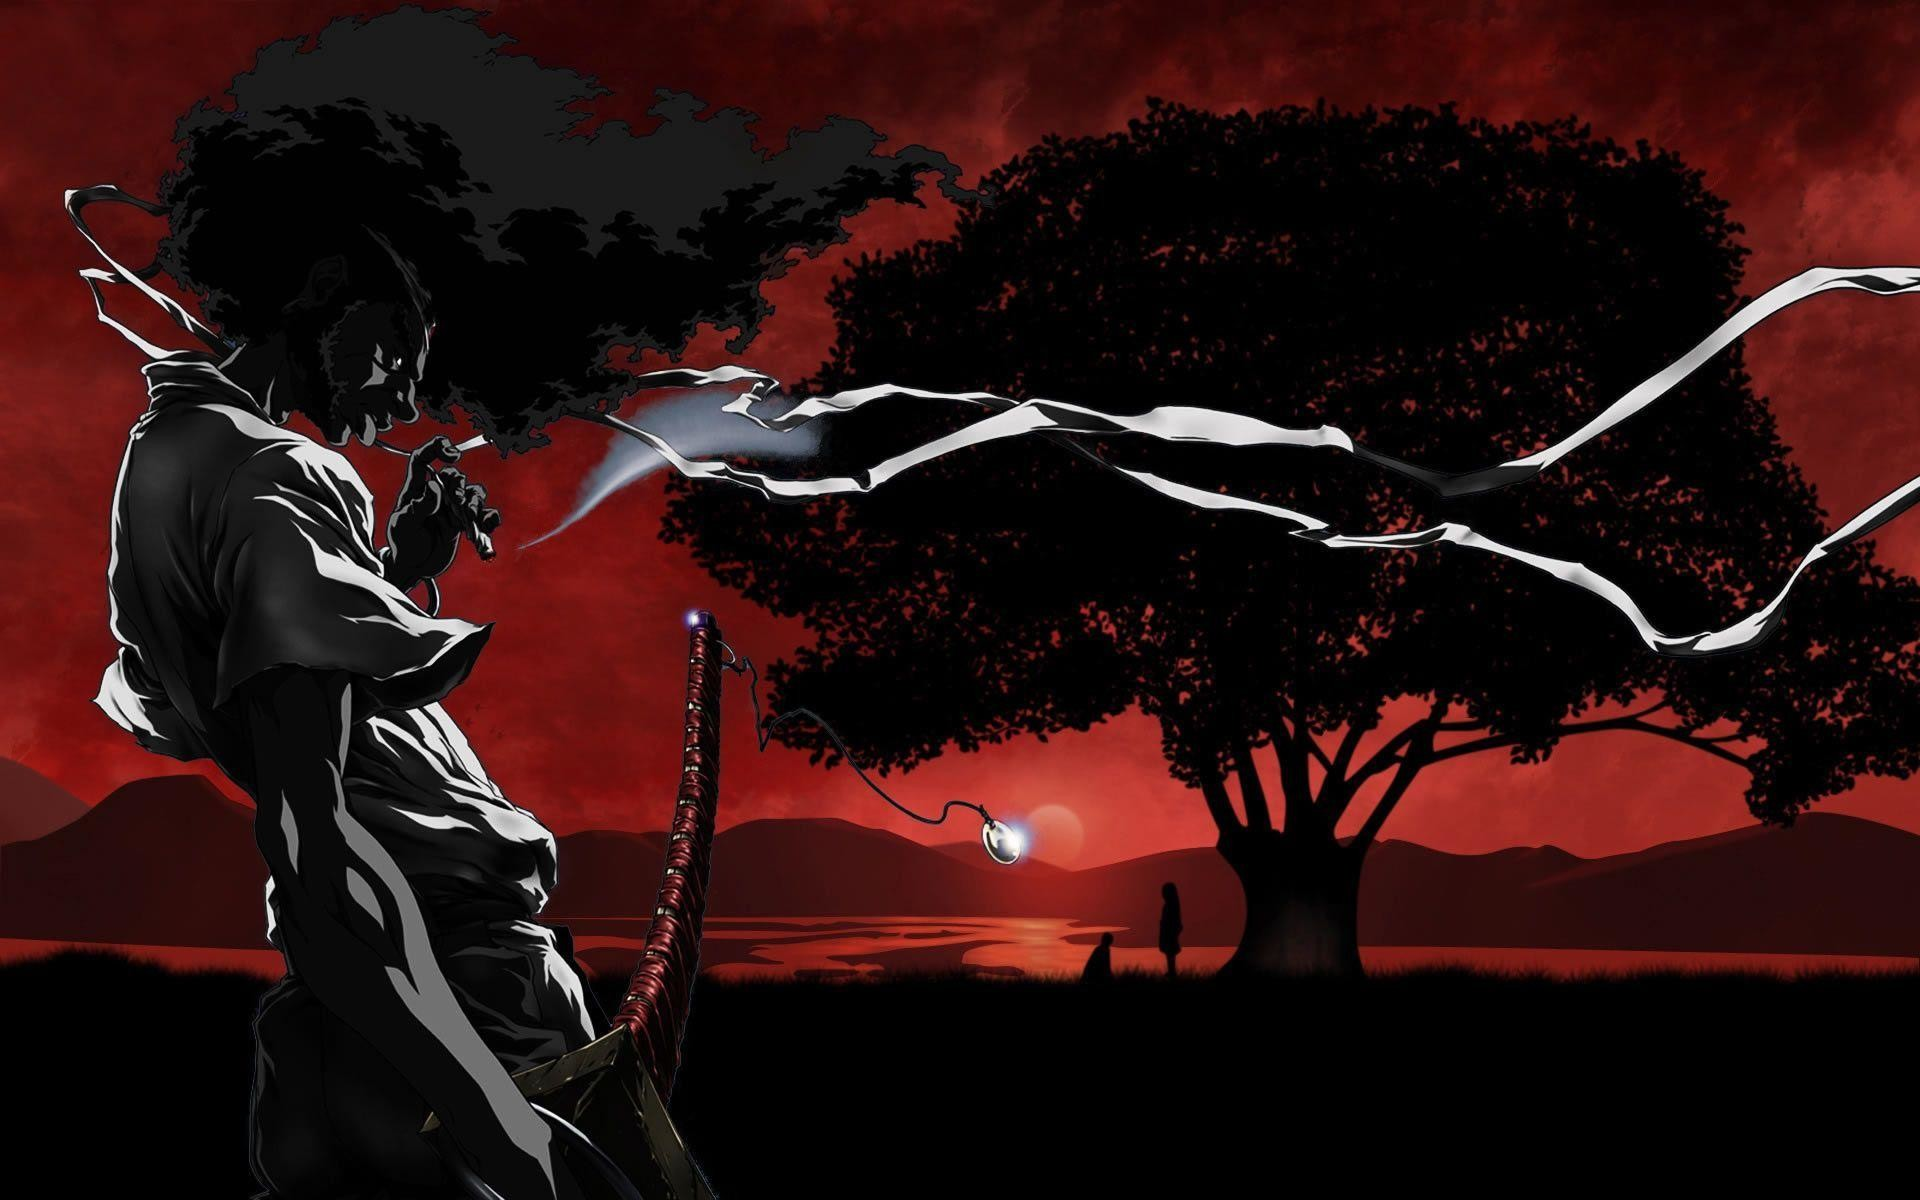 Afro Samurai smoking